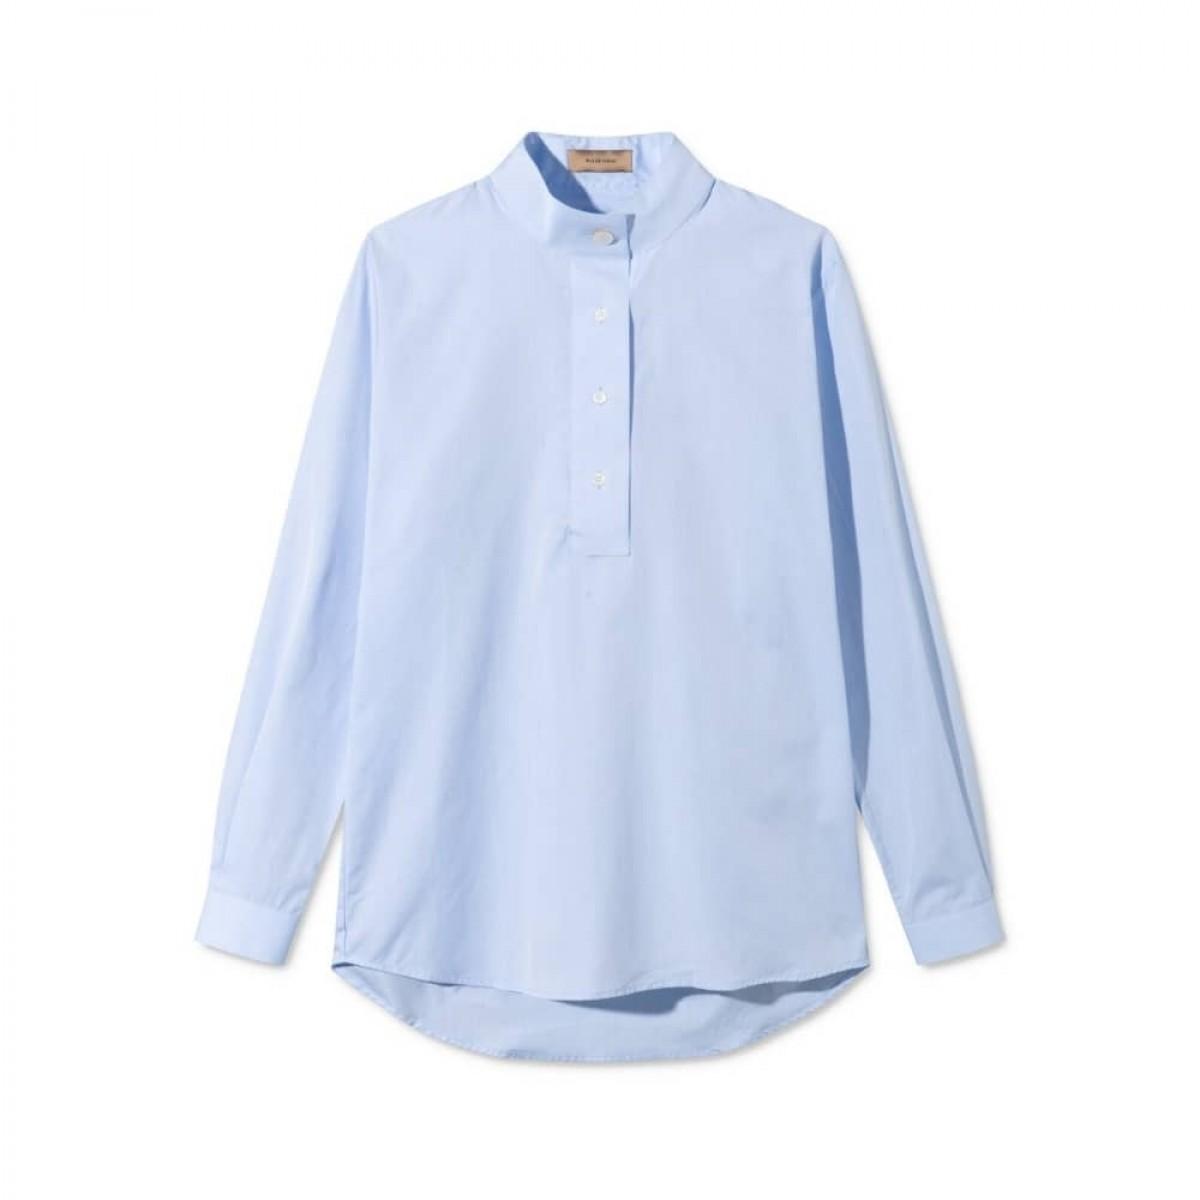 sera skjorte - light blue